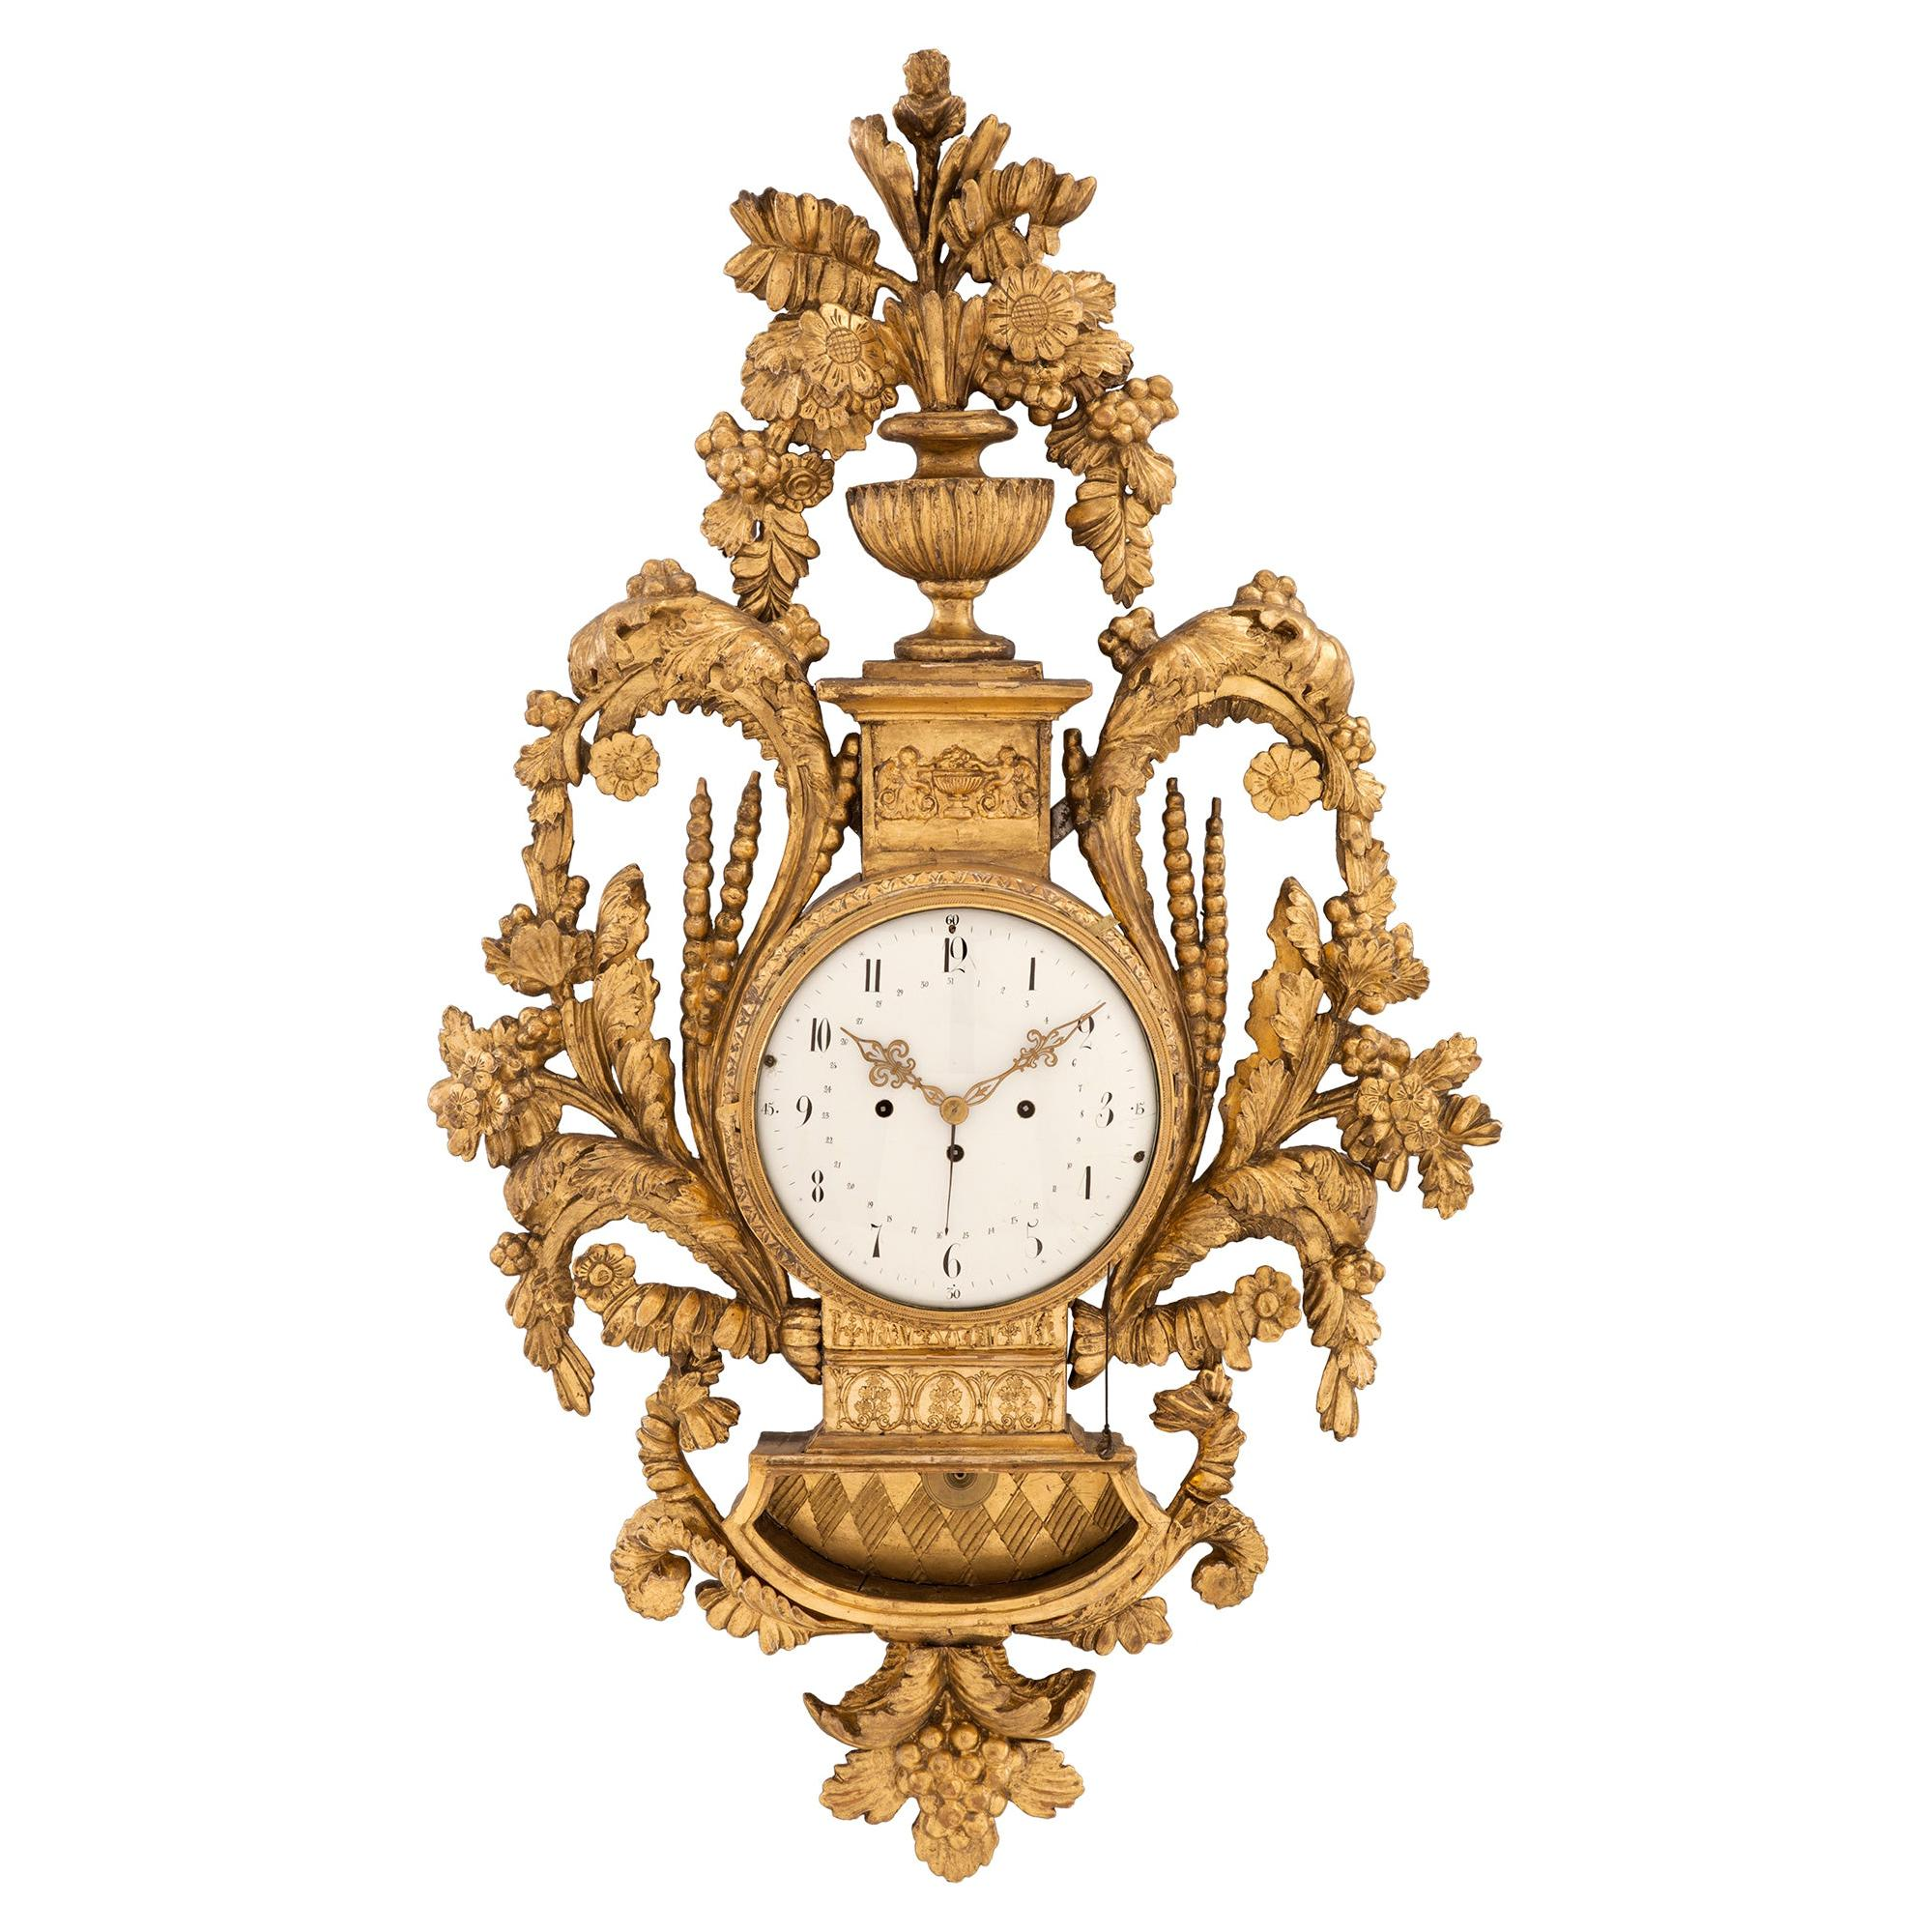 Austrian 18th Century Louis XVI Period Giltwood Cartel Blind Man's Clock